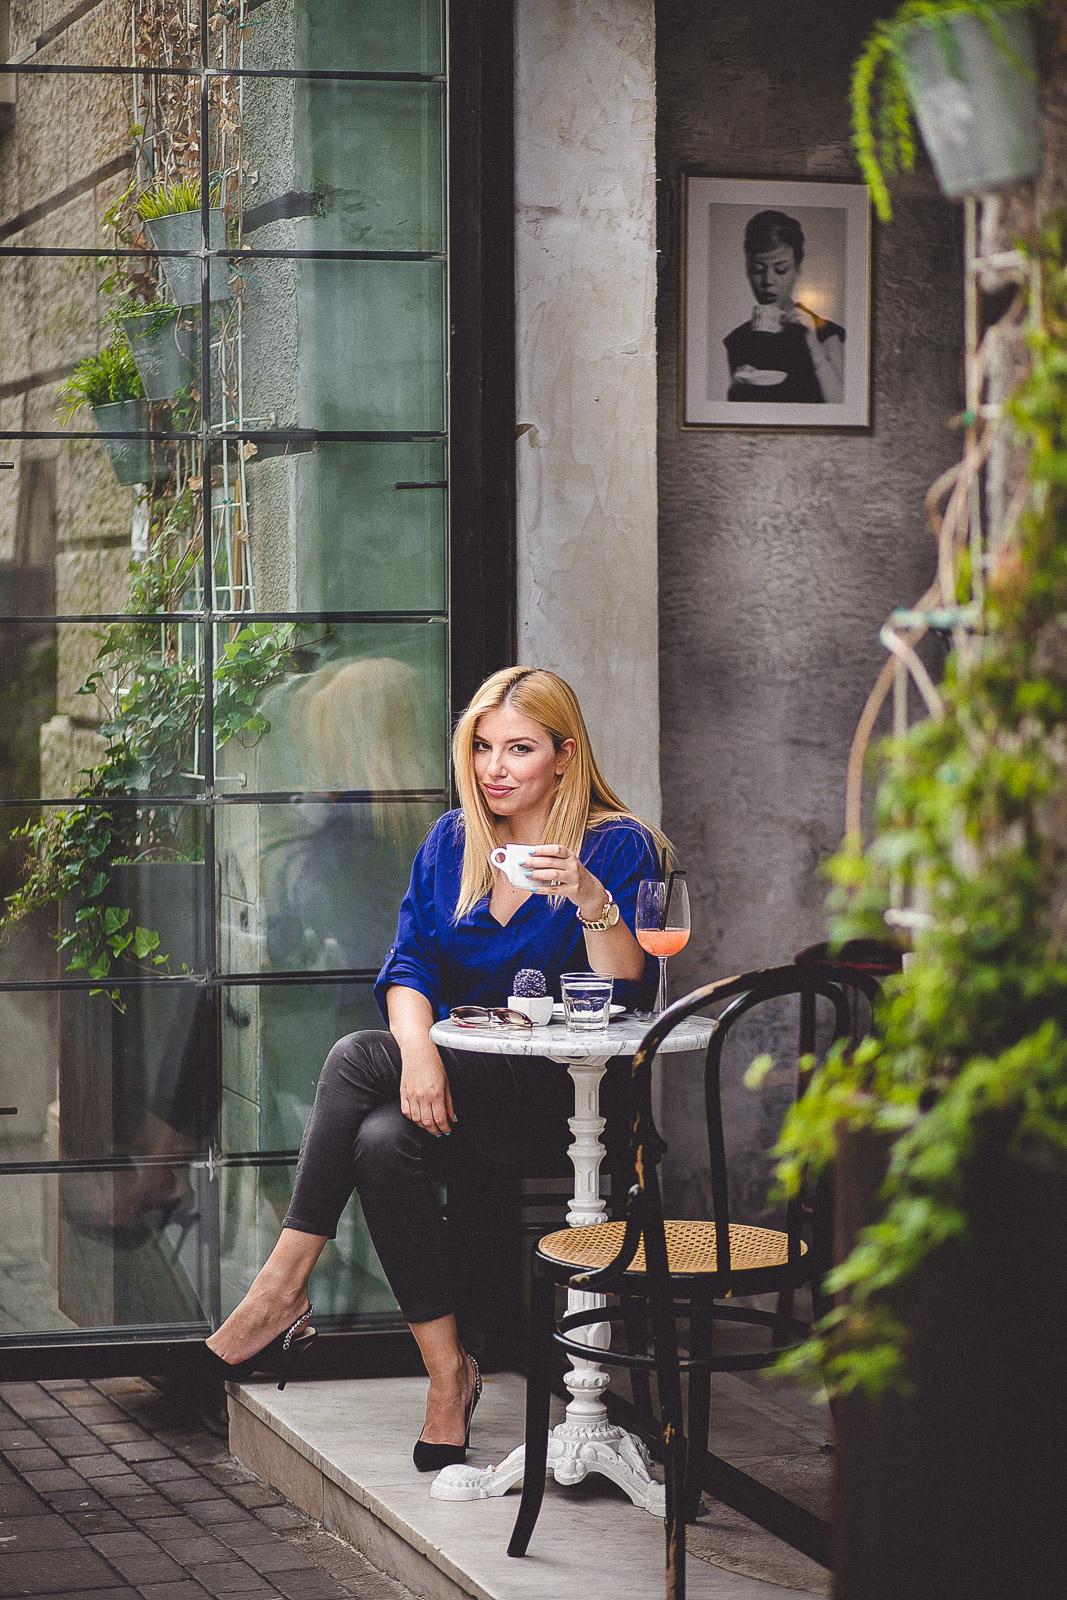 Dragana_Portraits-2.jpg